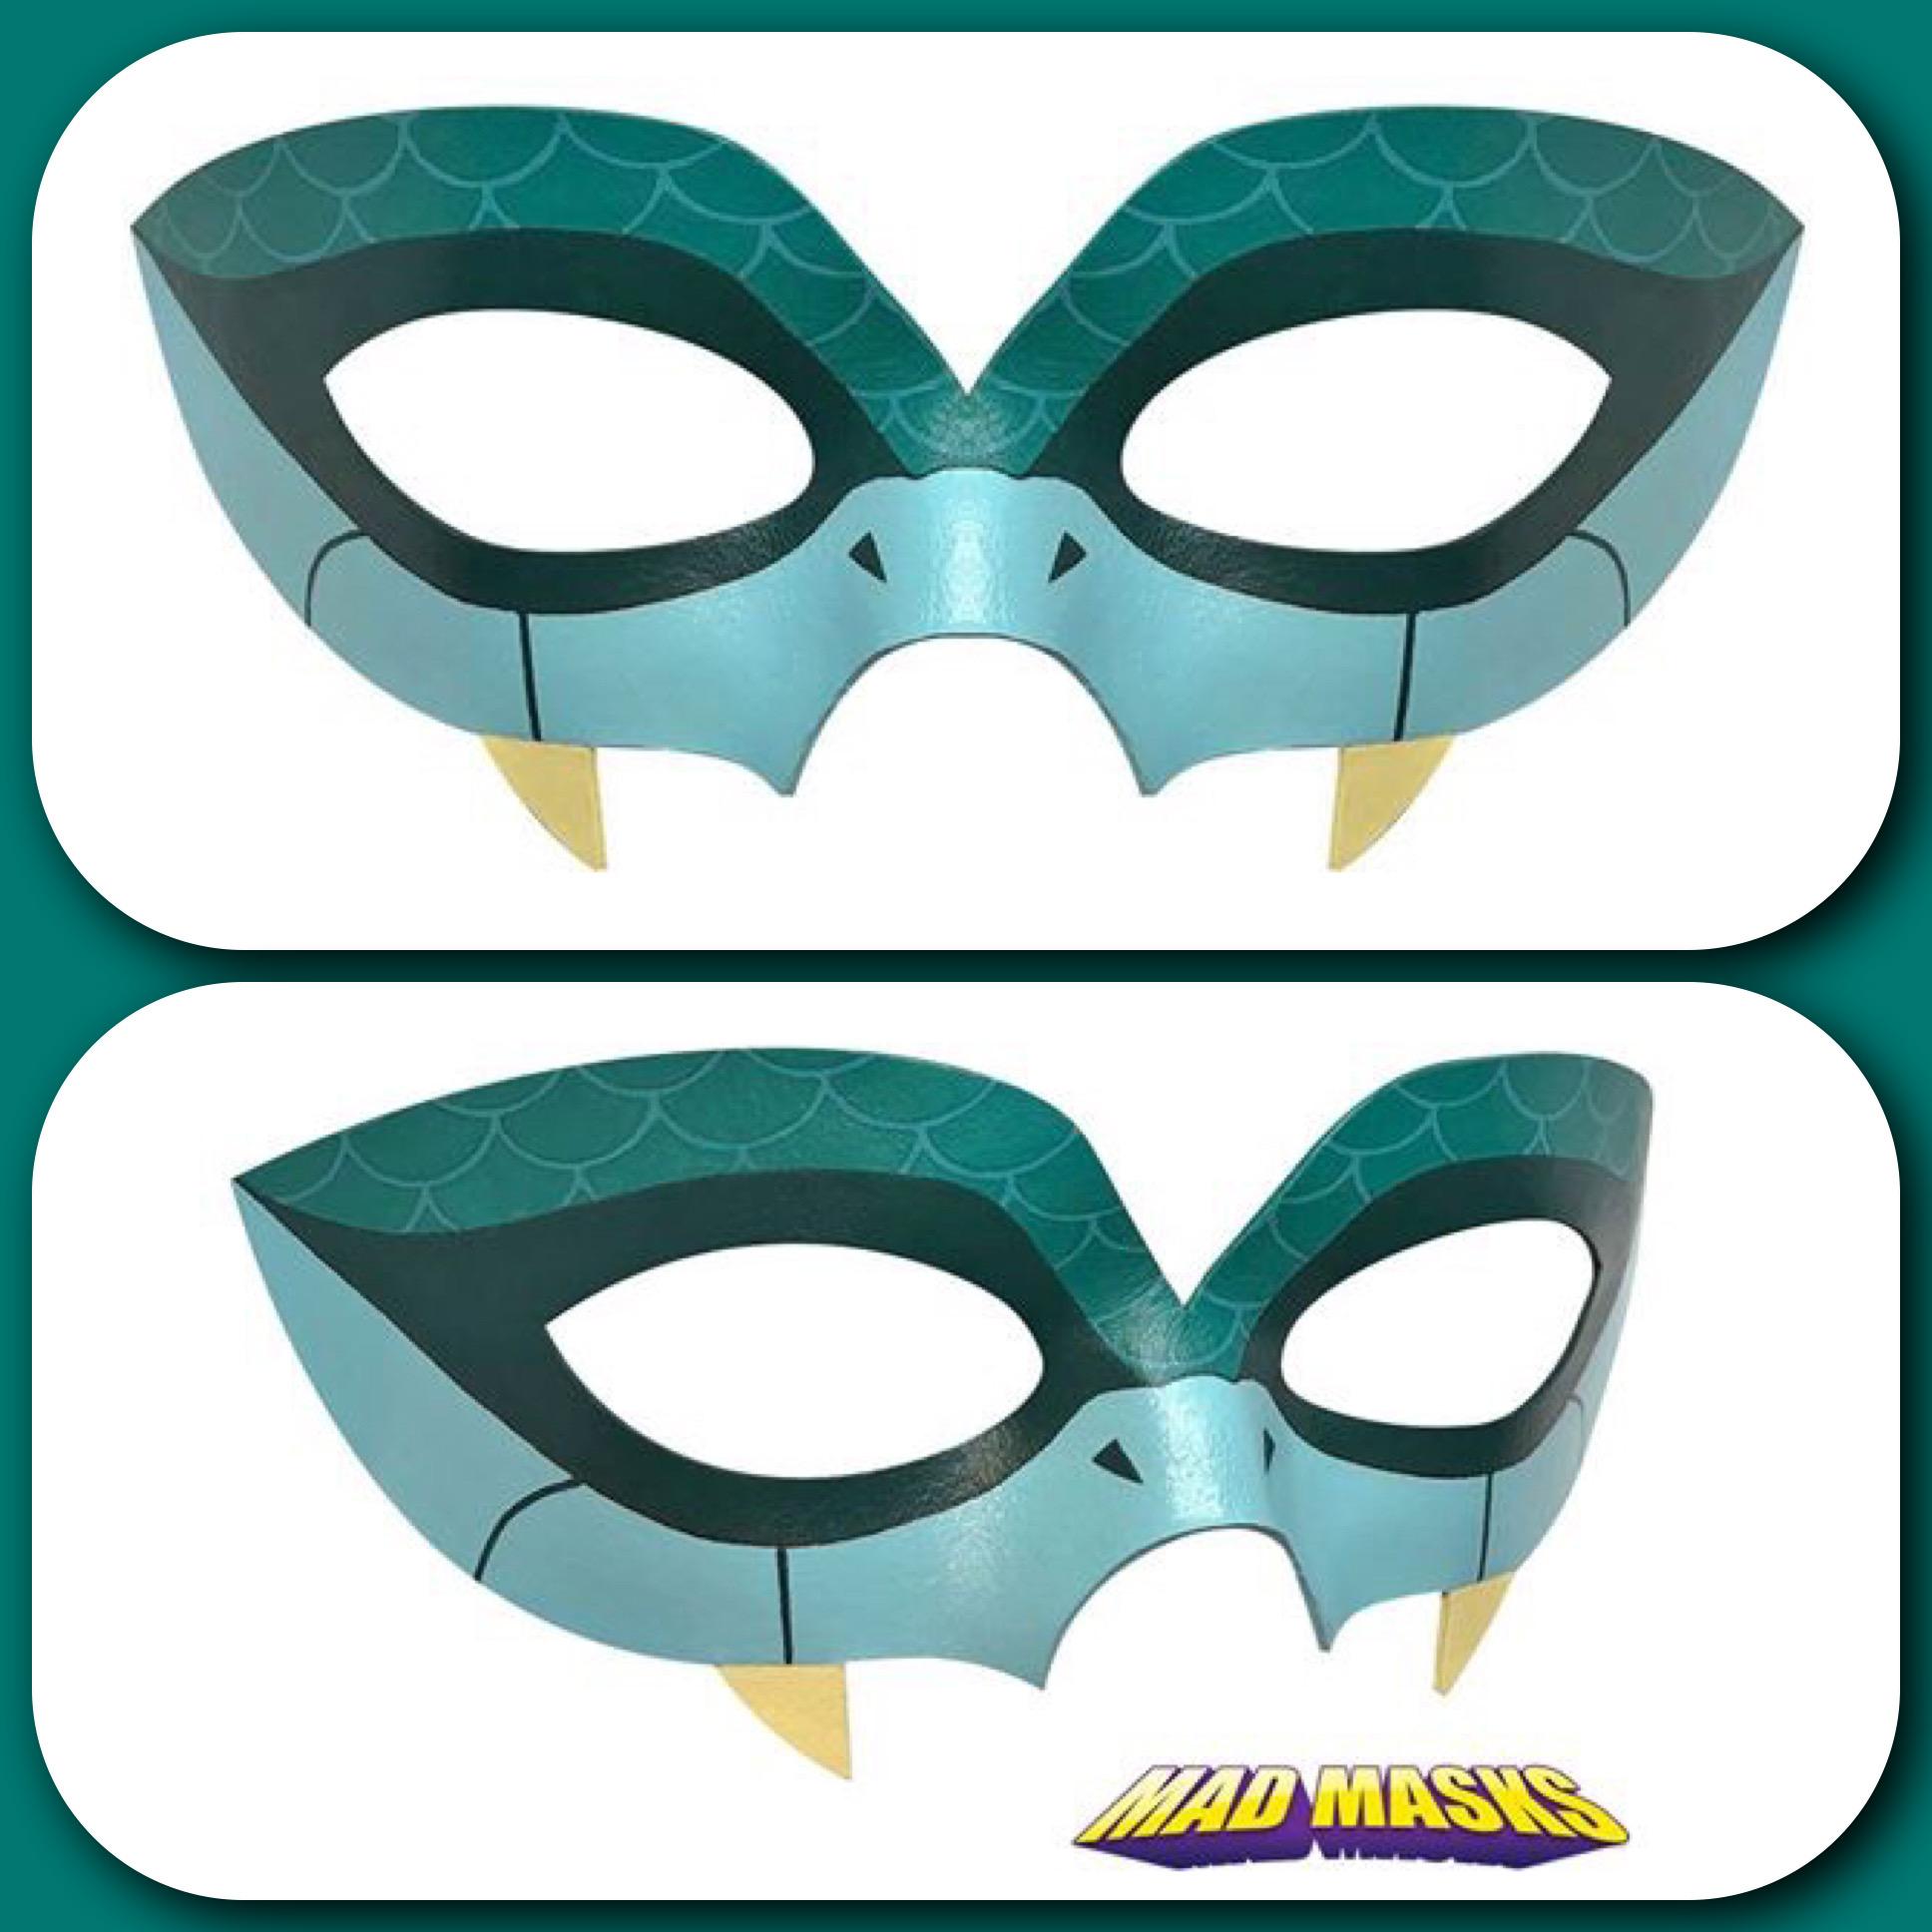 viperion-mask.jpg